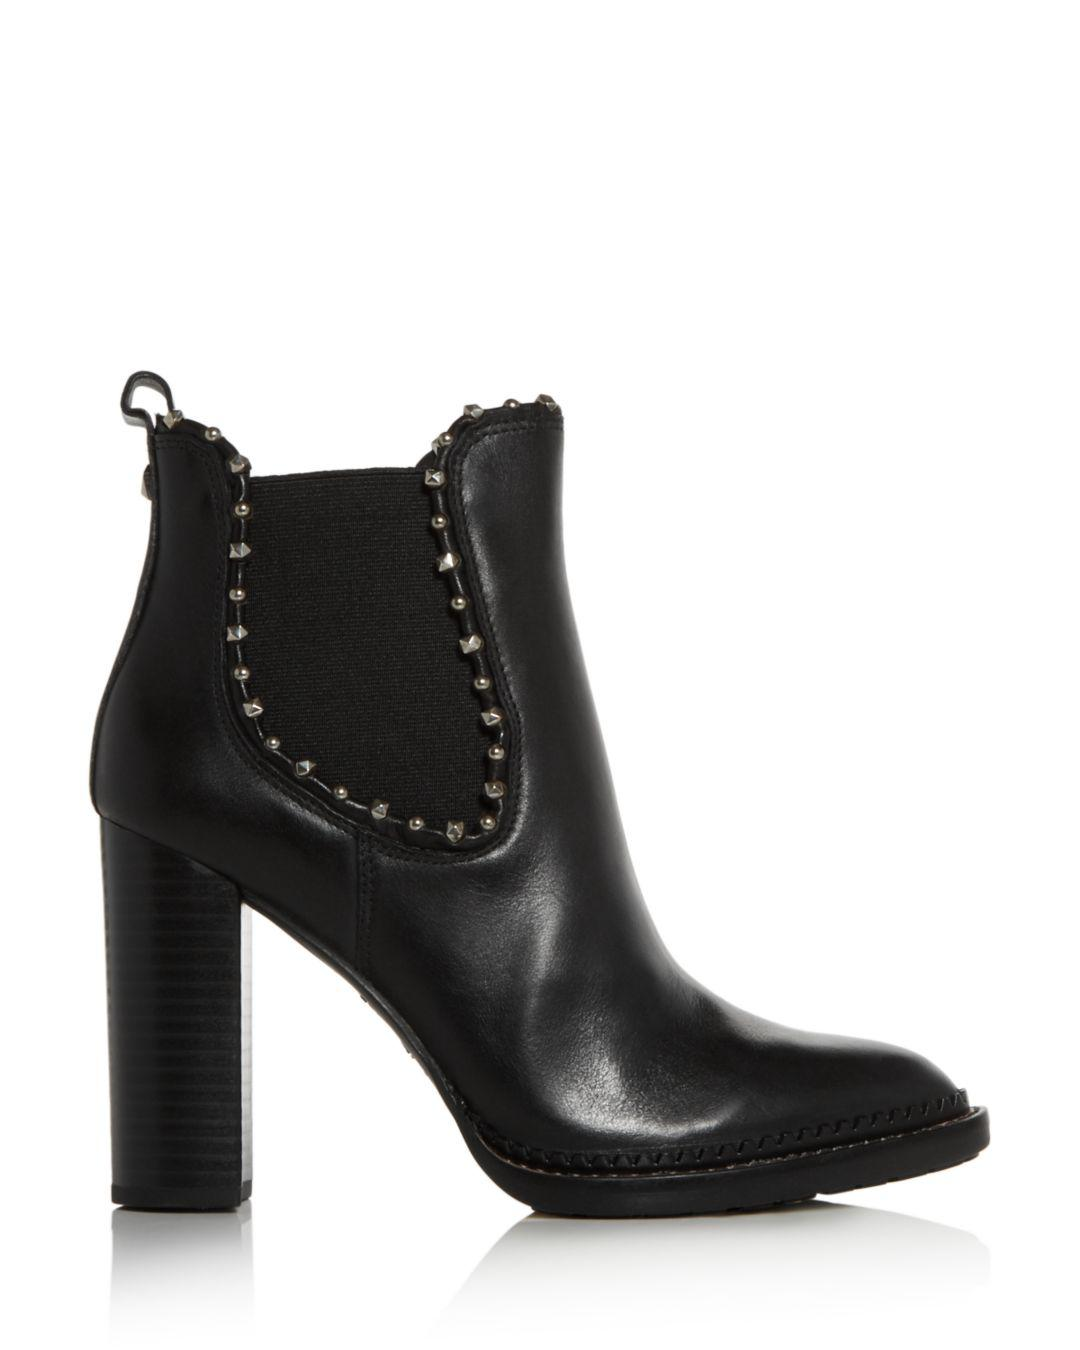 4c85a9e3c1c Sam Edelman Black Women's Salma Studded High Block-heel Booties